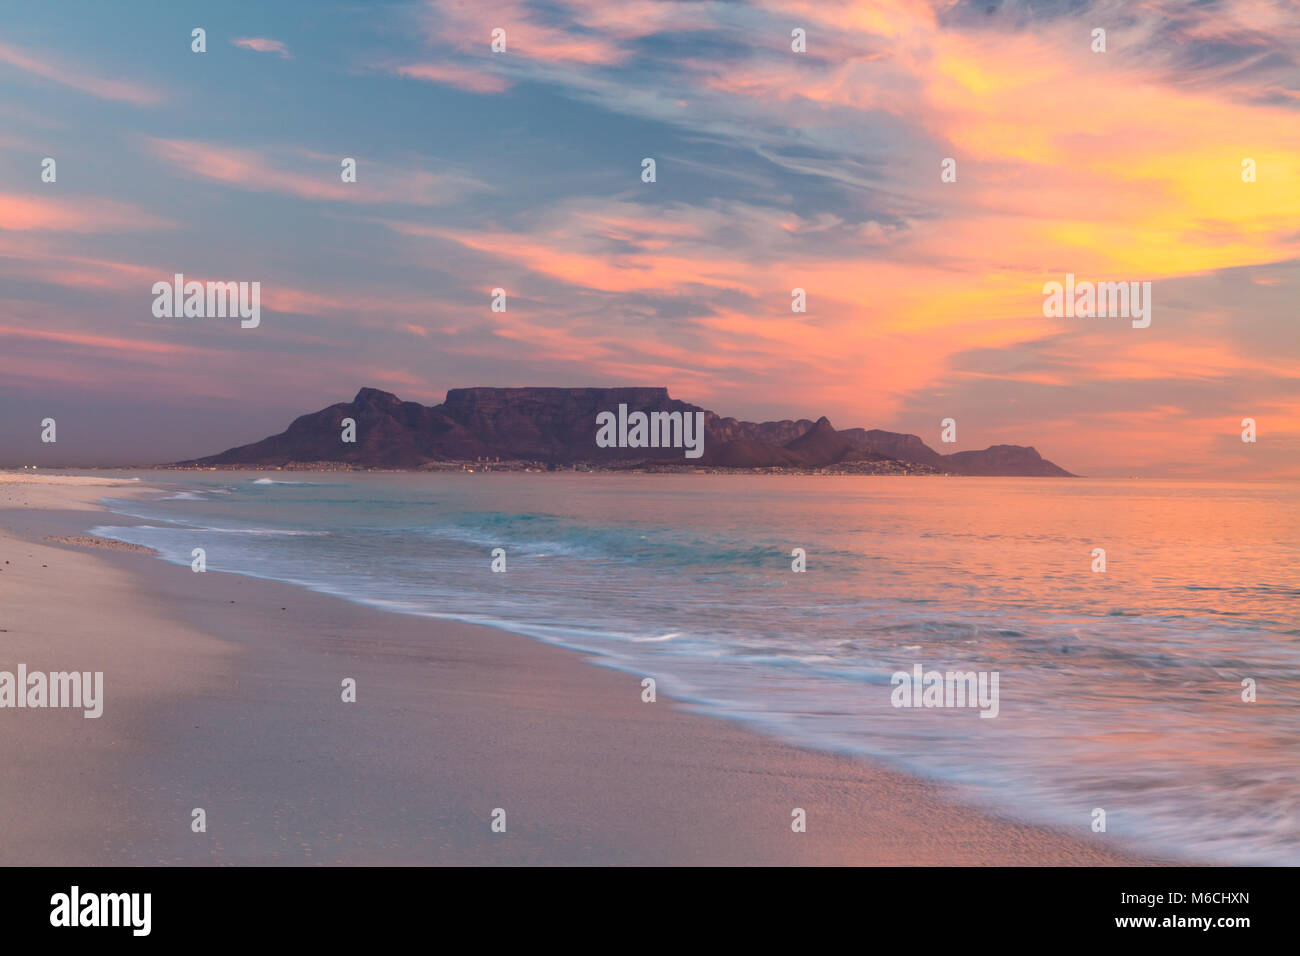 Malerischer Blick auf Table Mountain Kapstadt Südafrika von blouberg bei Sonnenuntergang Stockbild